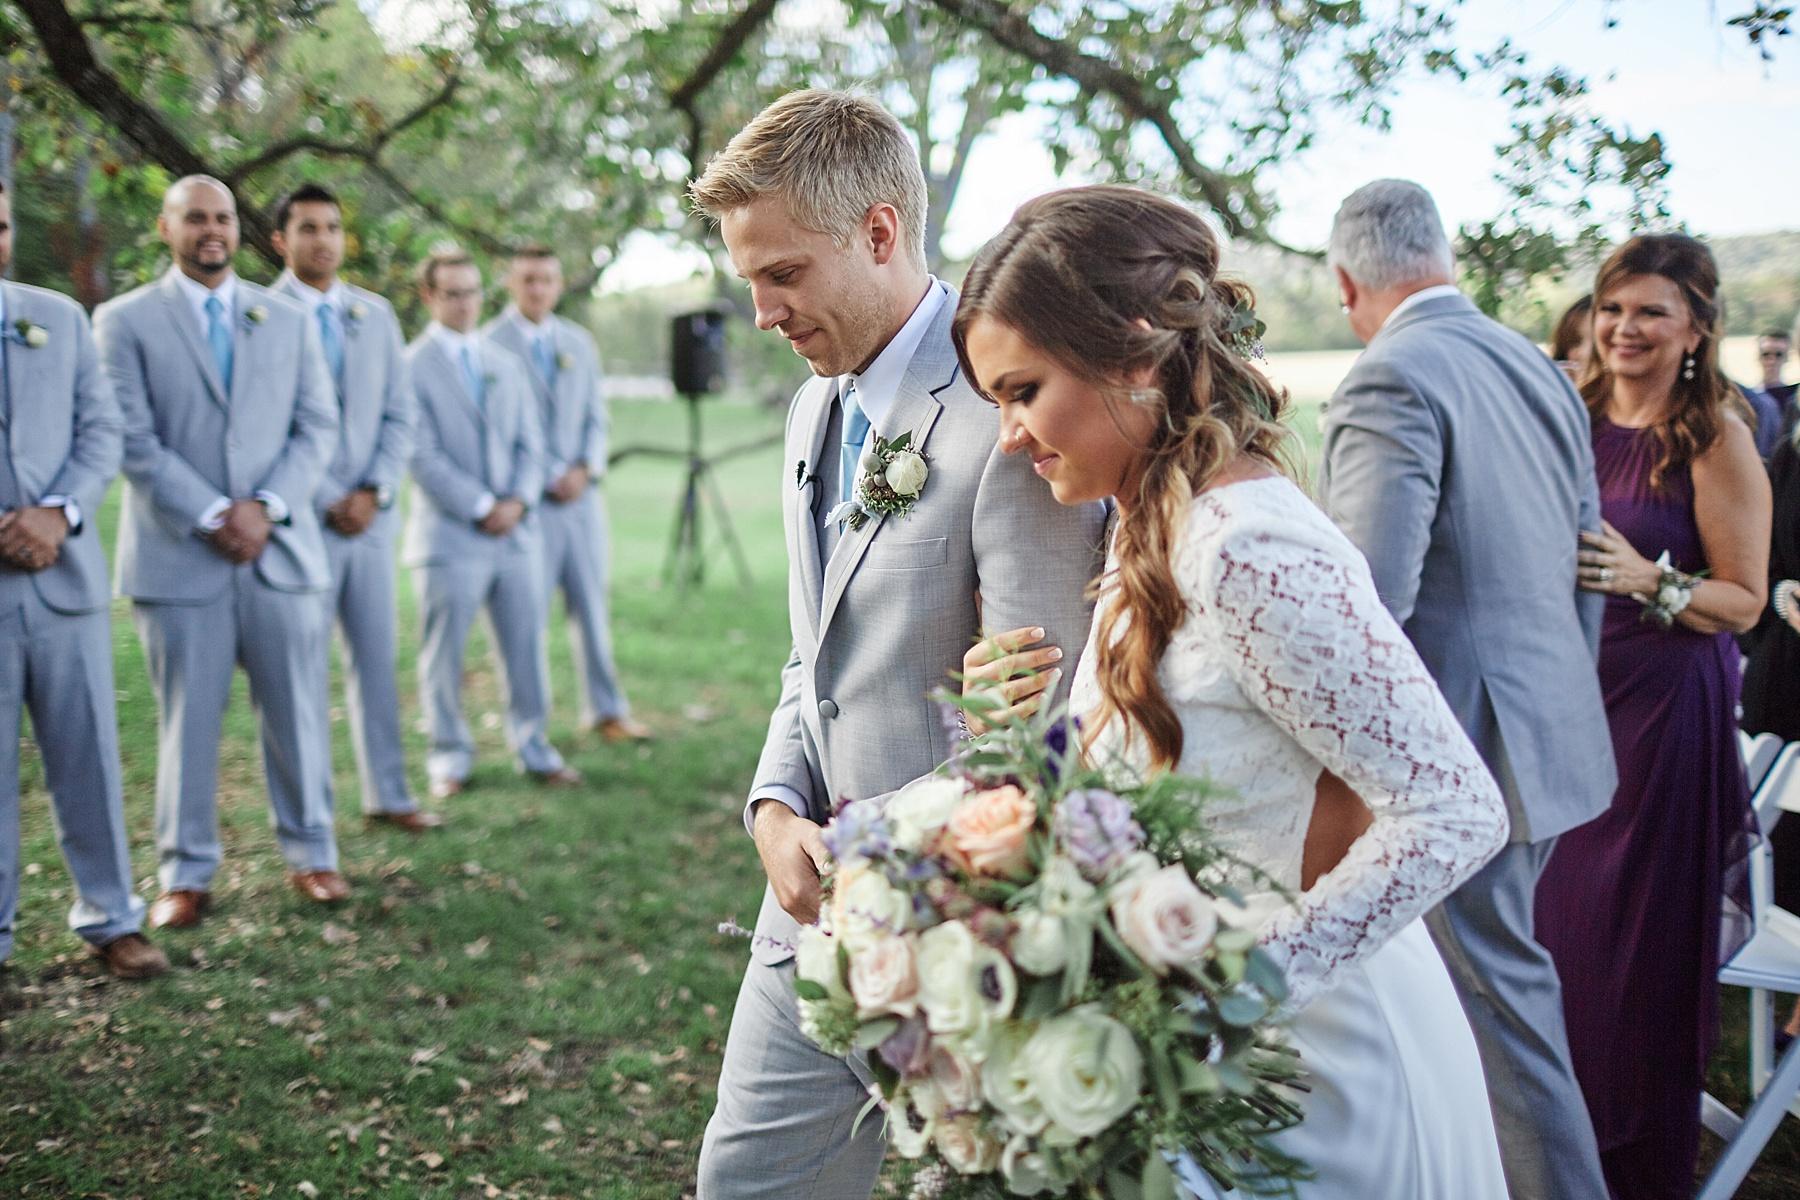 Maywood-Stone-Barn-Wedding-Rochester-Minnesota-Perry-James-Photo_0638.jpg